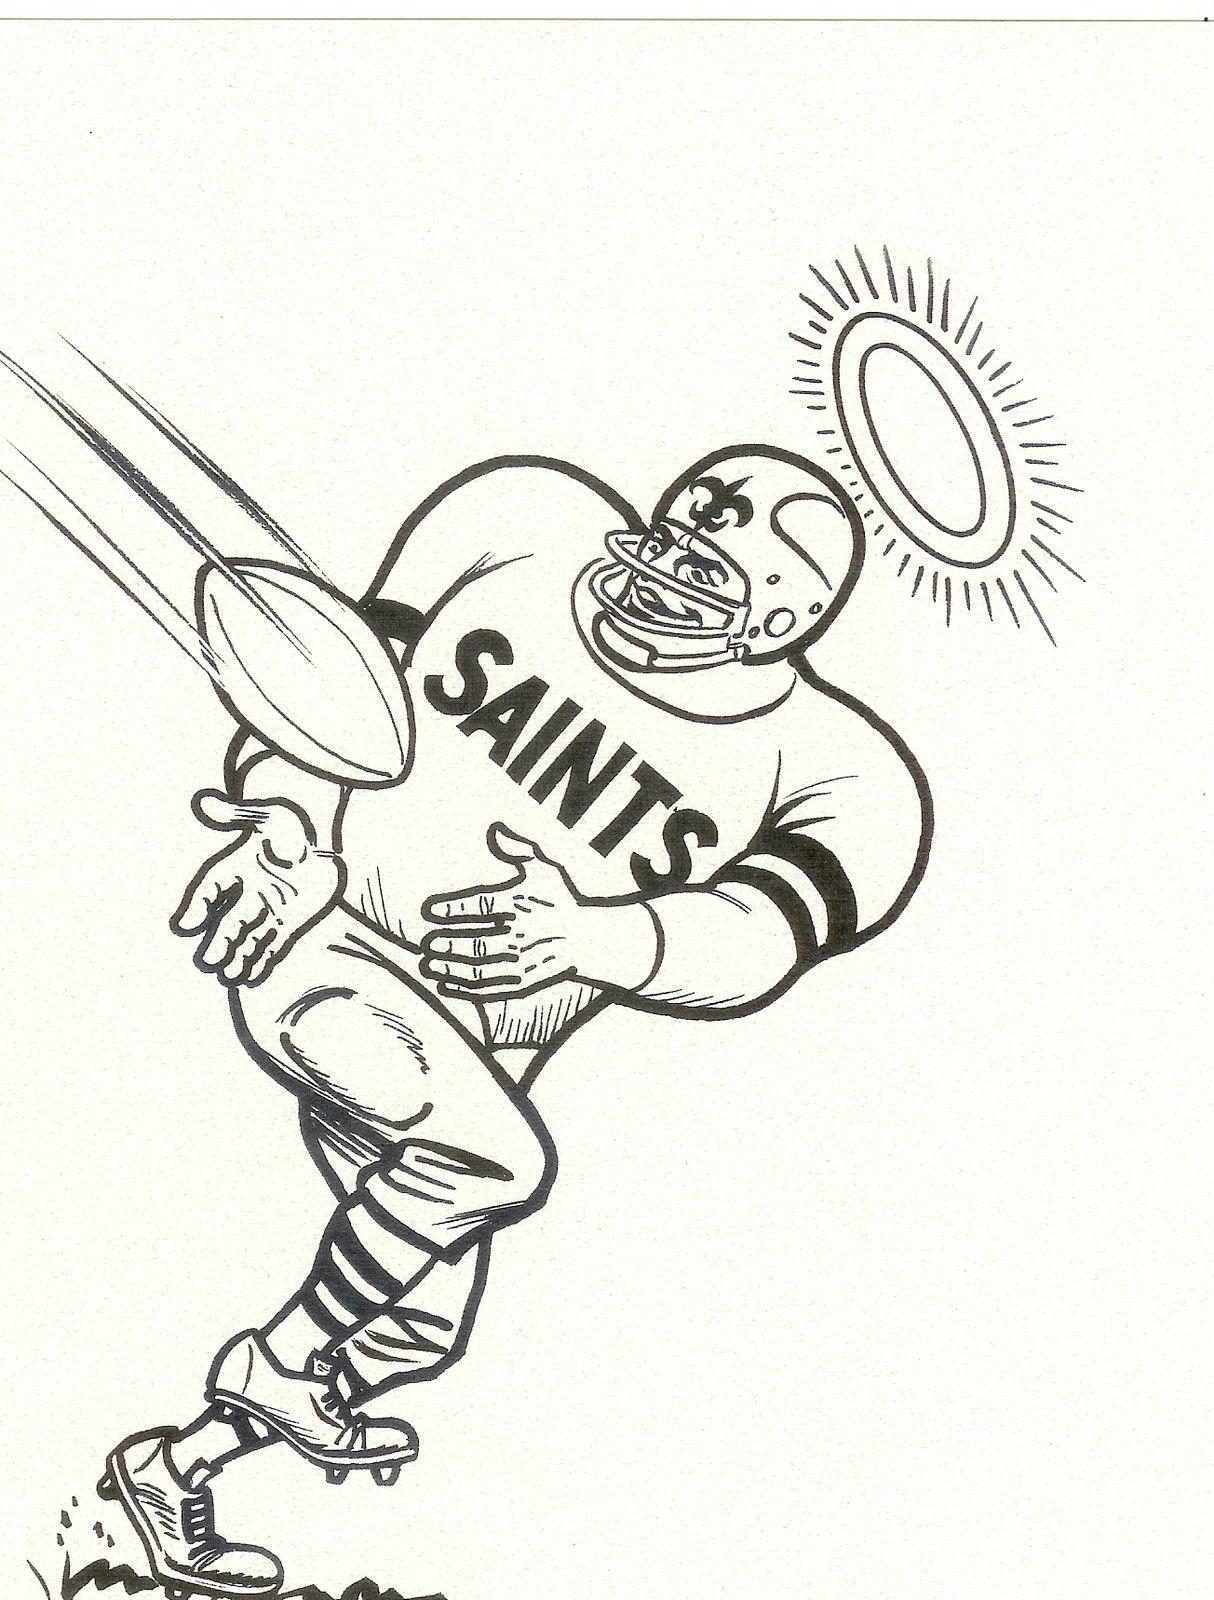 New Orleans Saints Coloring Page